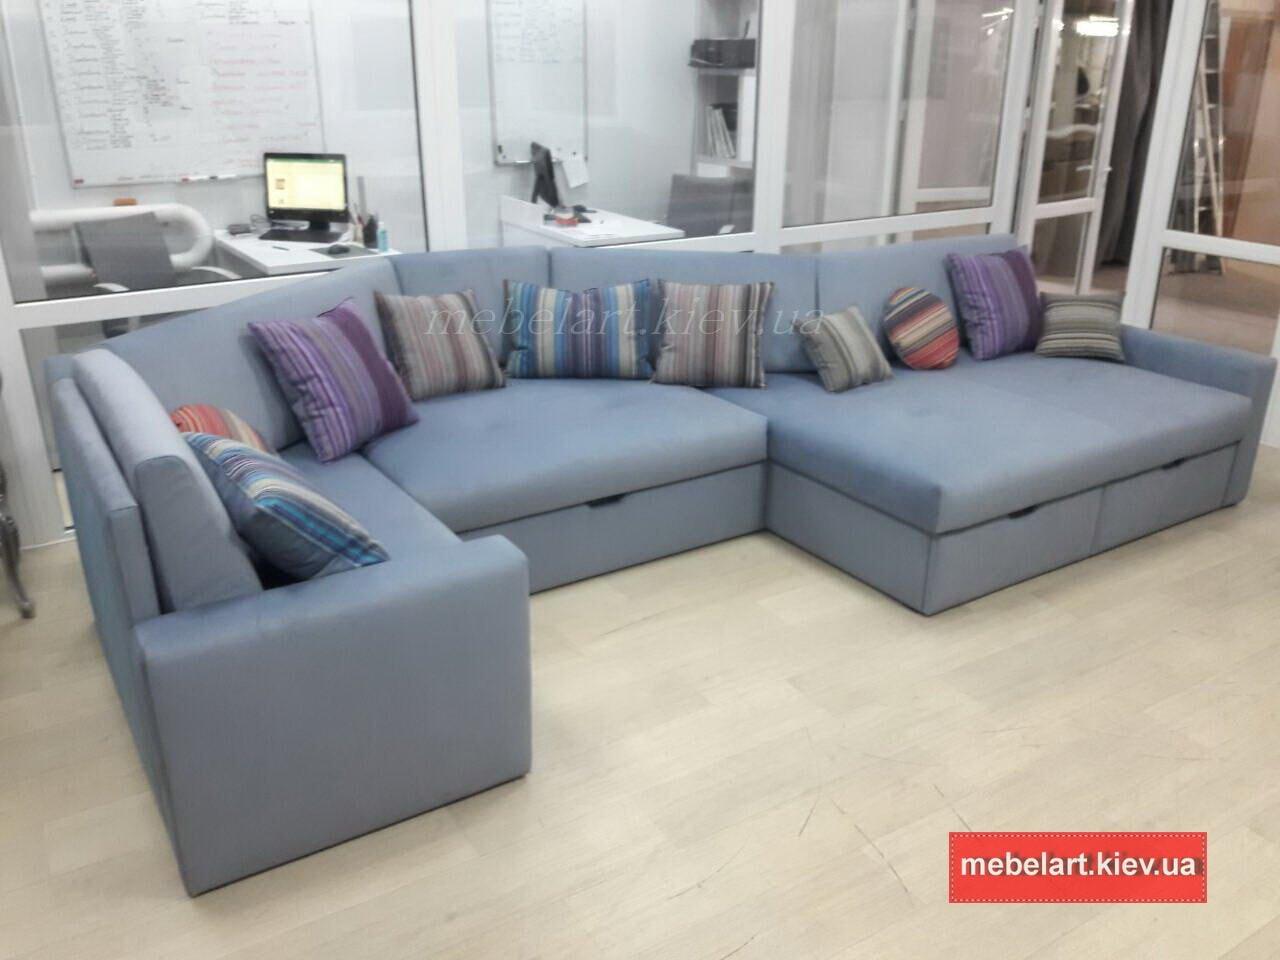 дизайн-проект двухуглового дивана на заказ